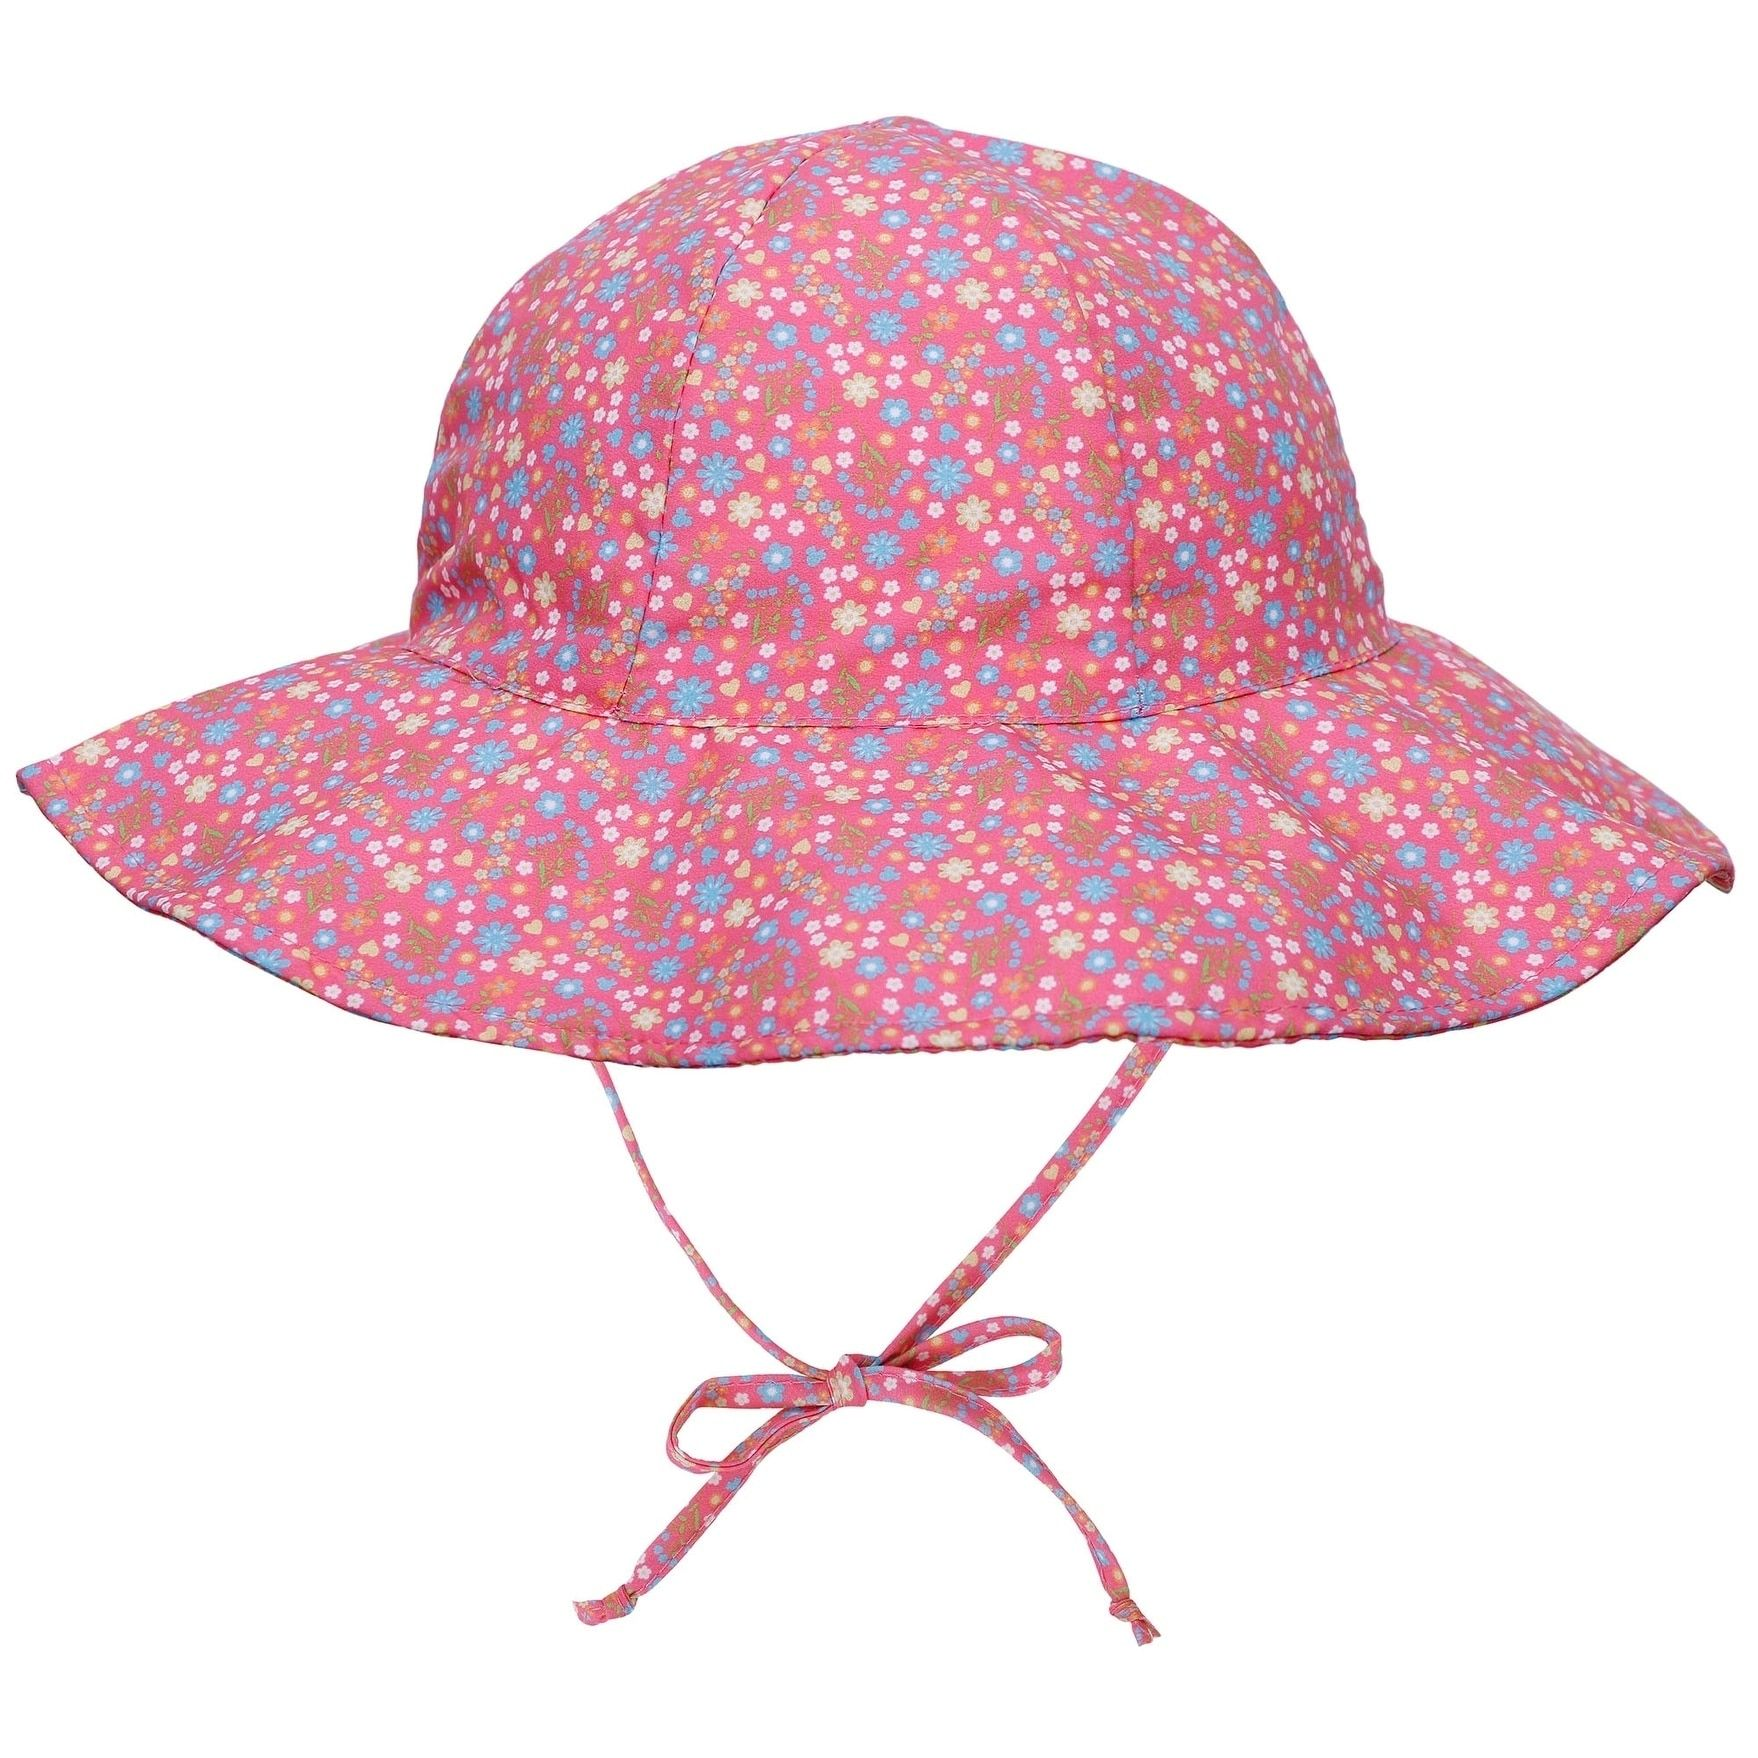 UPF 50 Sun Protection Wide Brim Baby Sun Hat (pink flower - 0-12 months) 0b7f4a64cf3